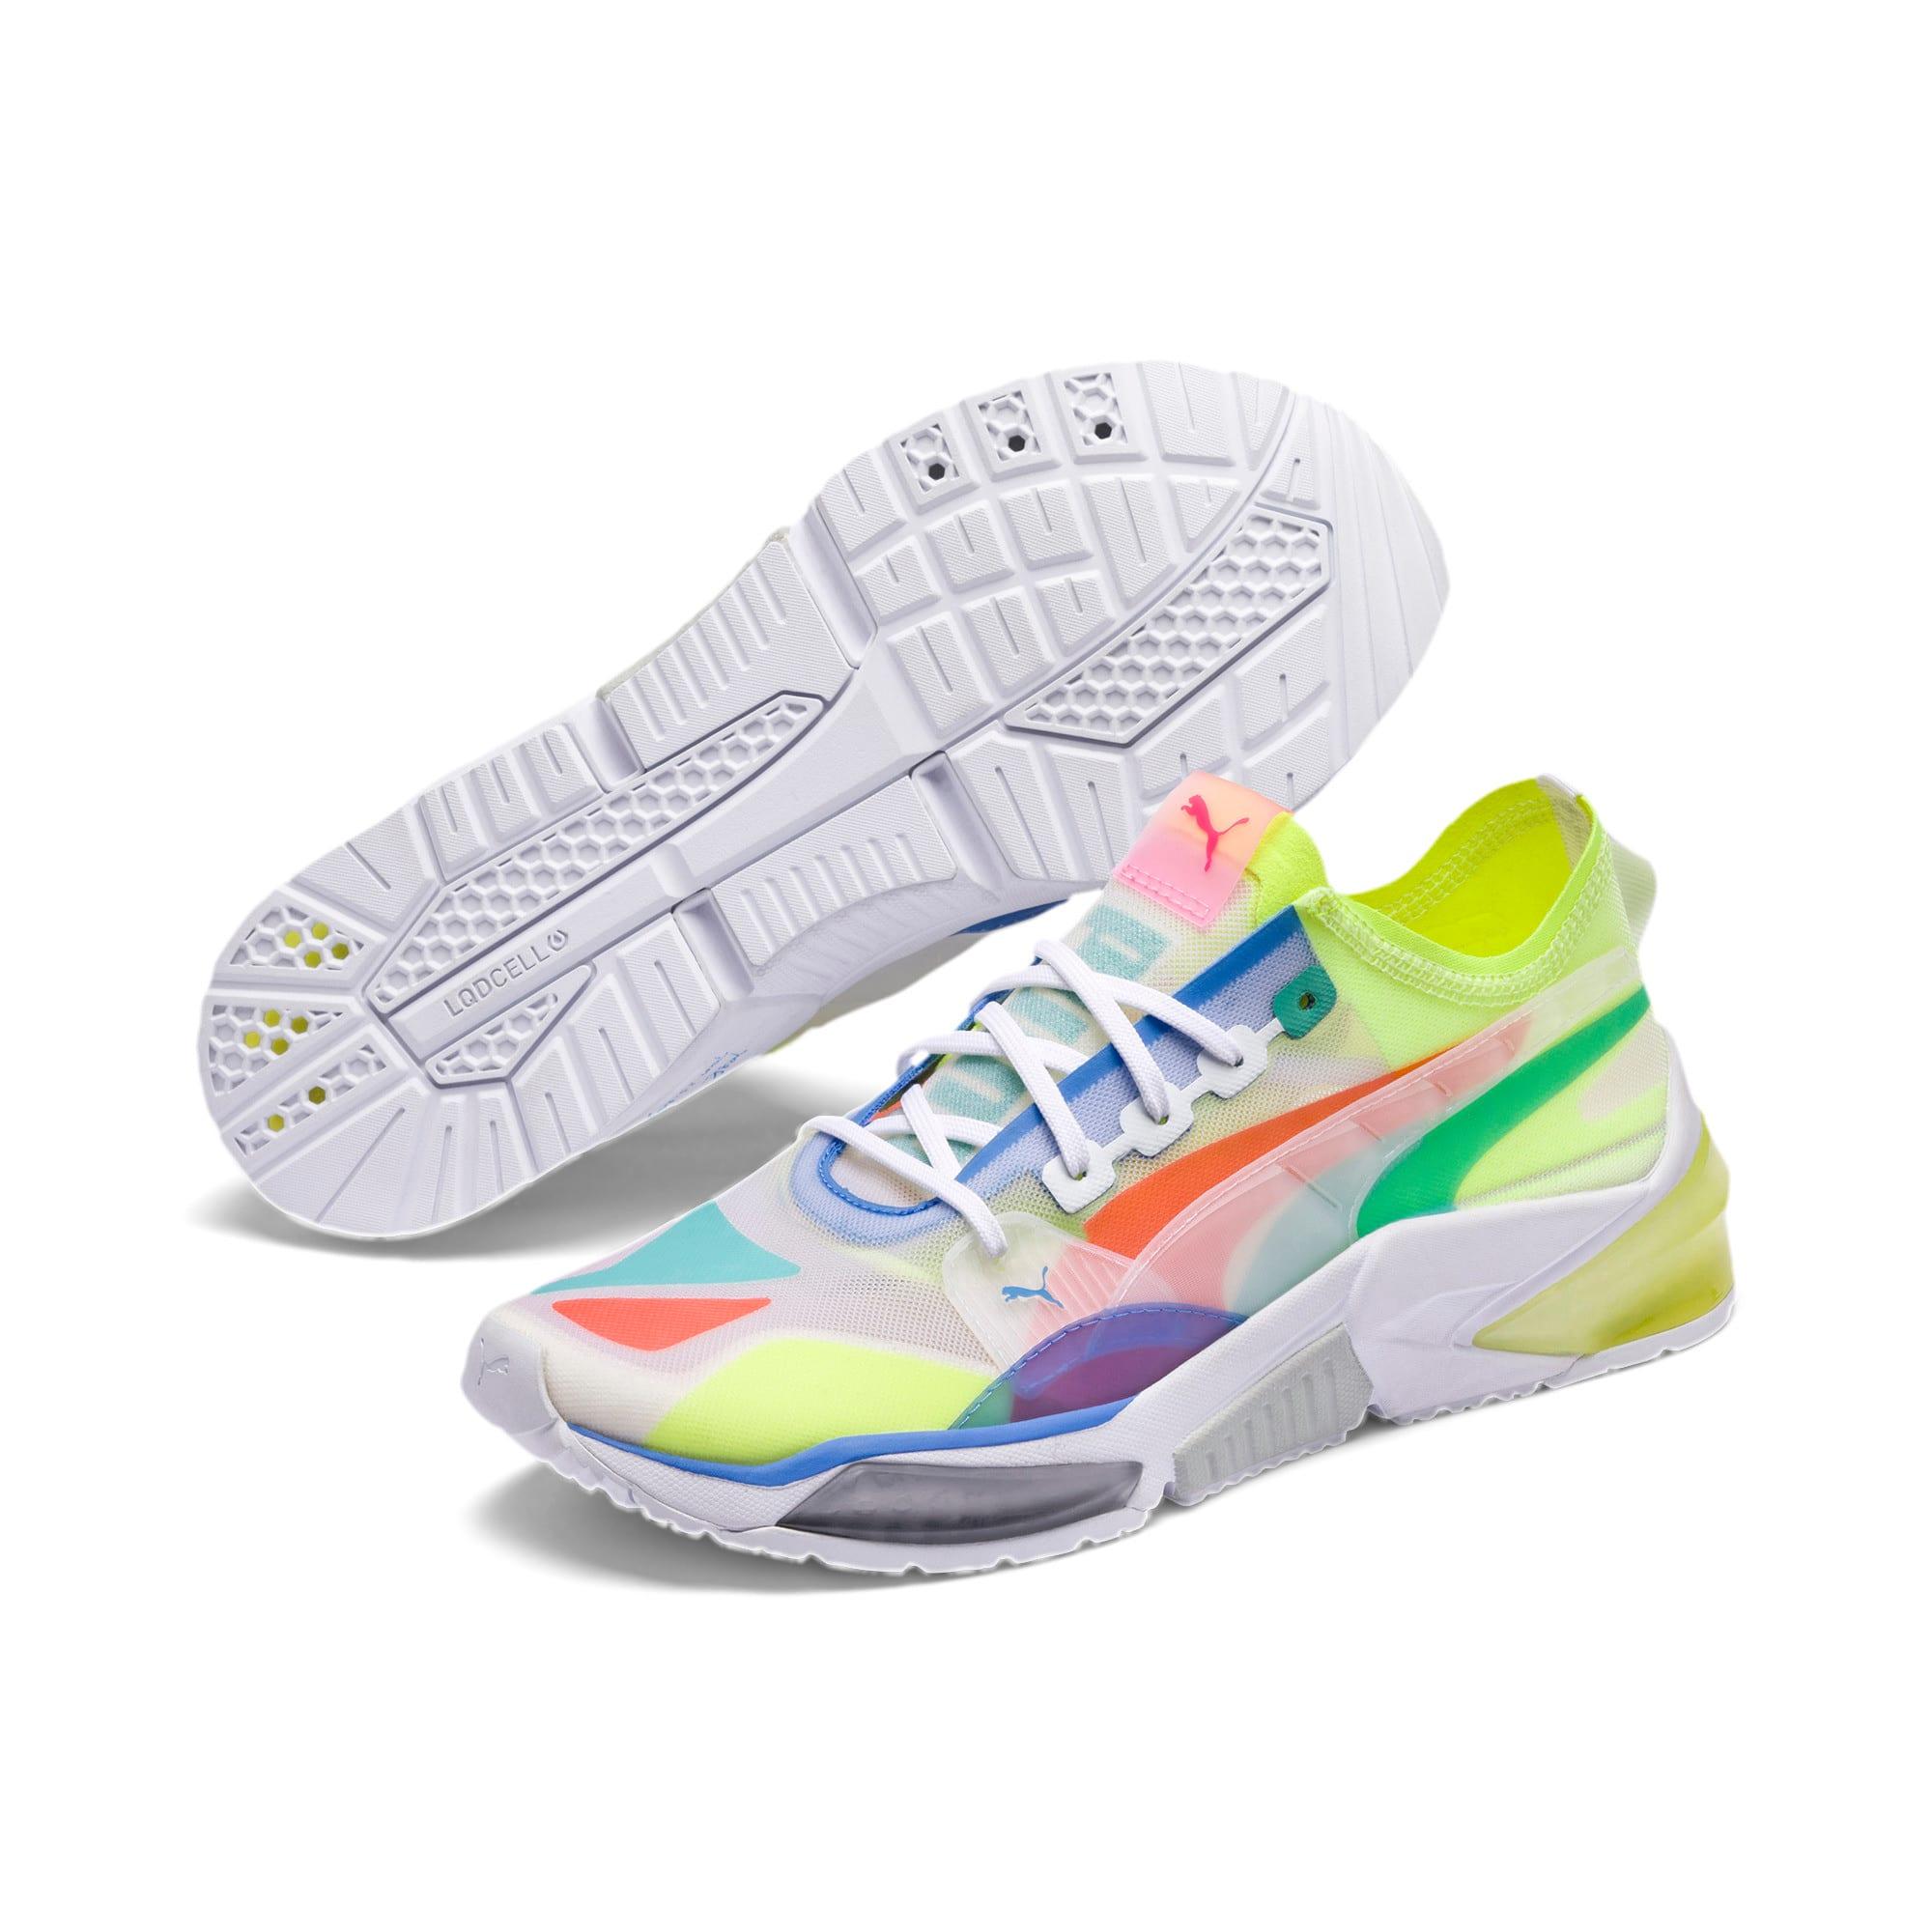 Thumbnail 3 of LQDCELL Optic Sheer Men's Training Shoes, Puma White, medium